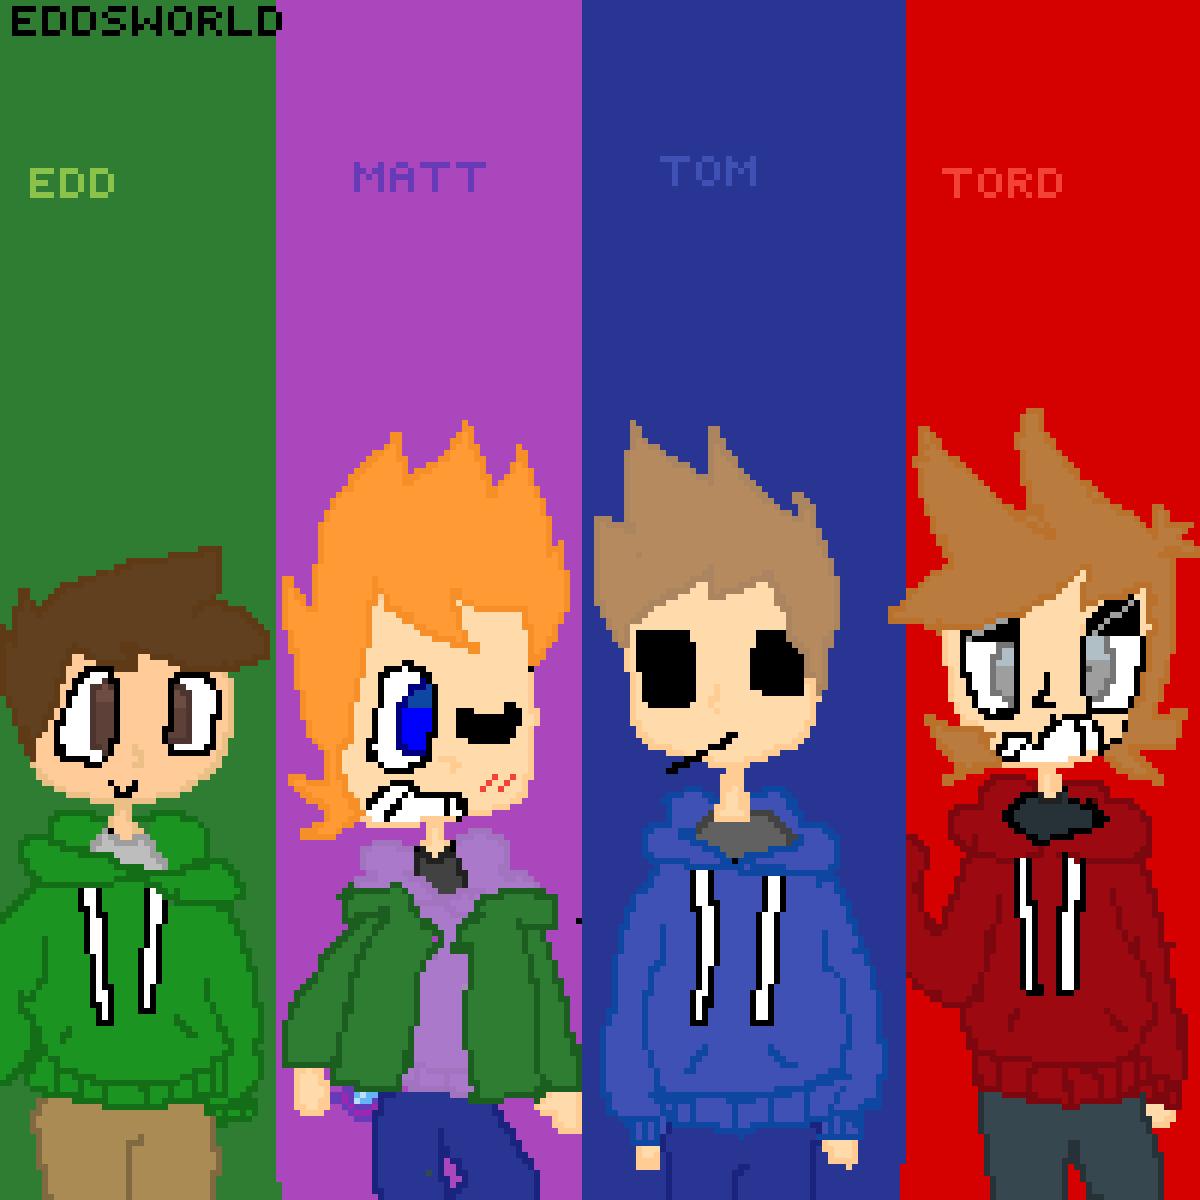 Eddsworld  gang